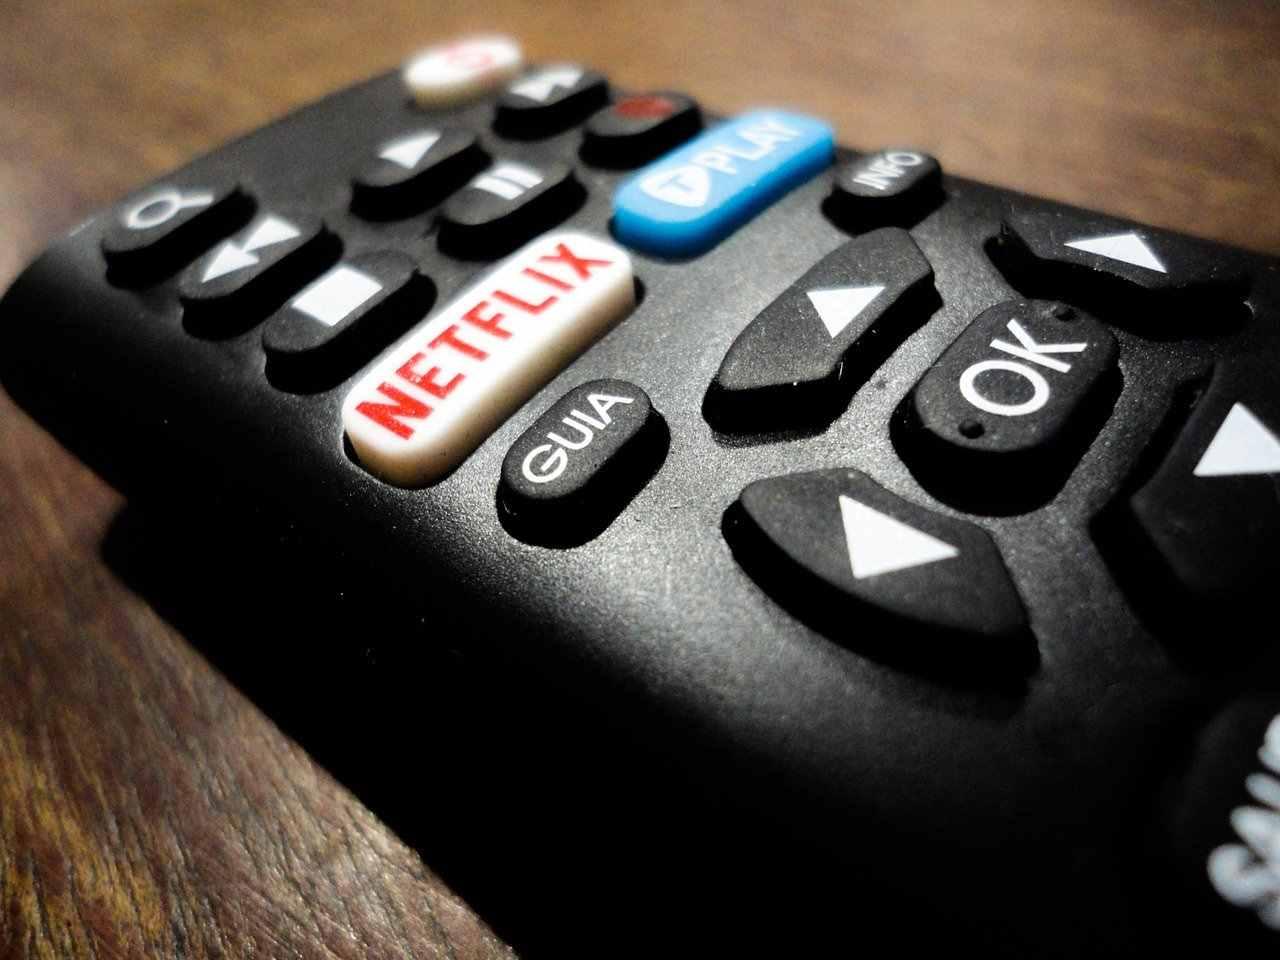 Classifica Netflix